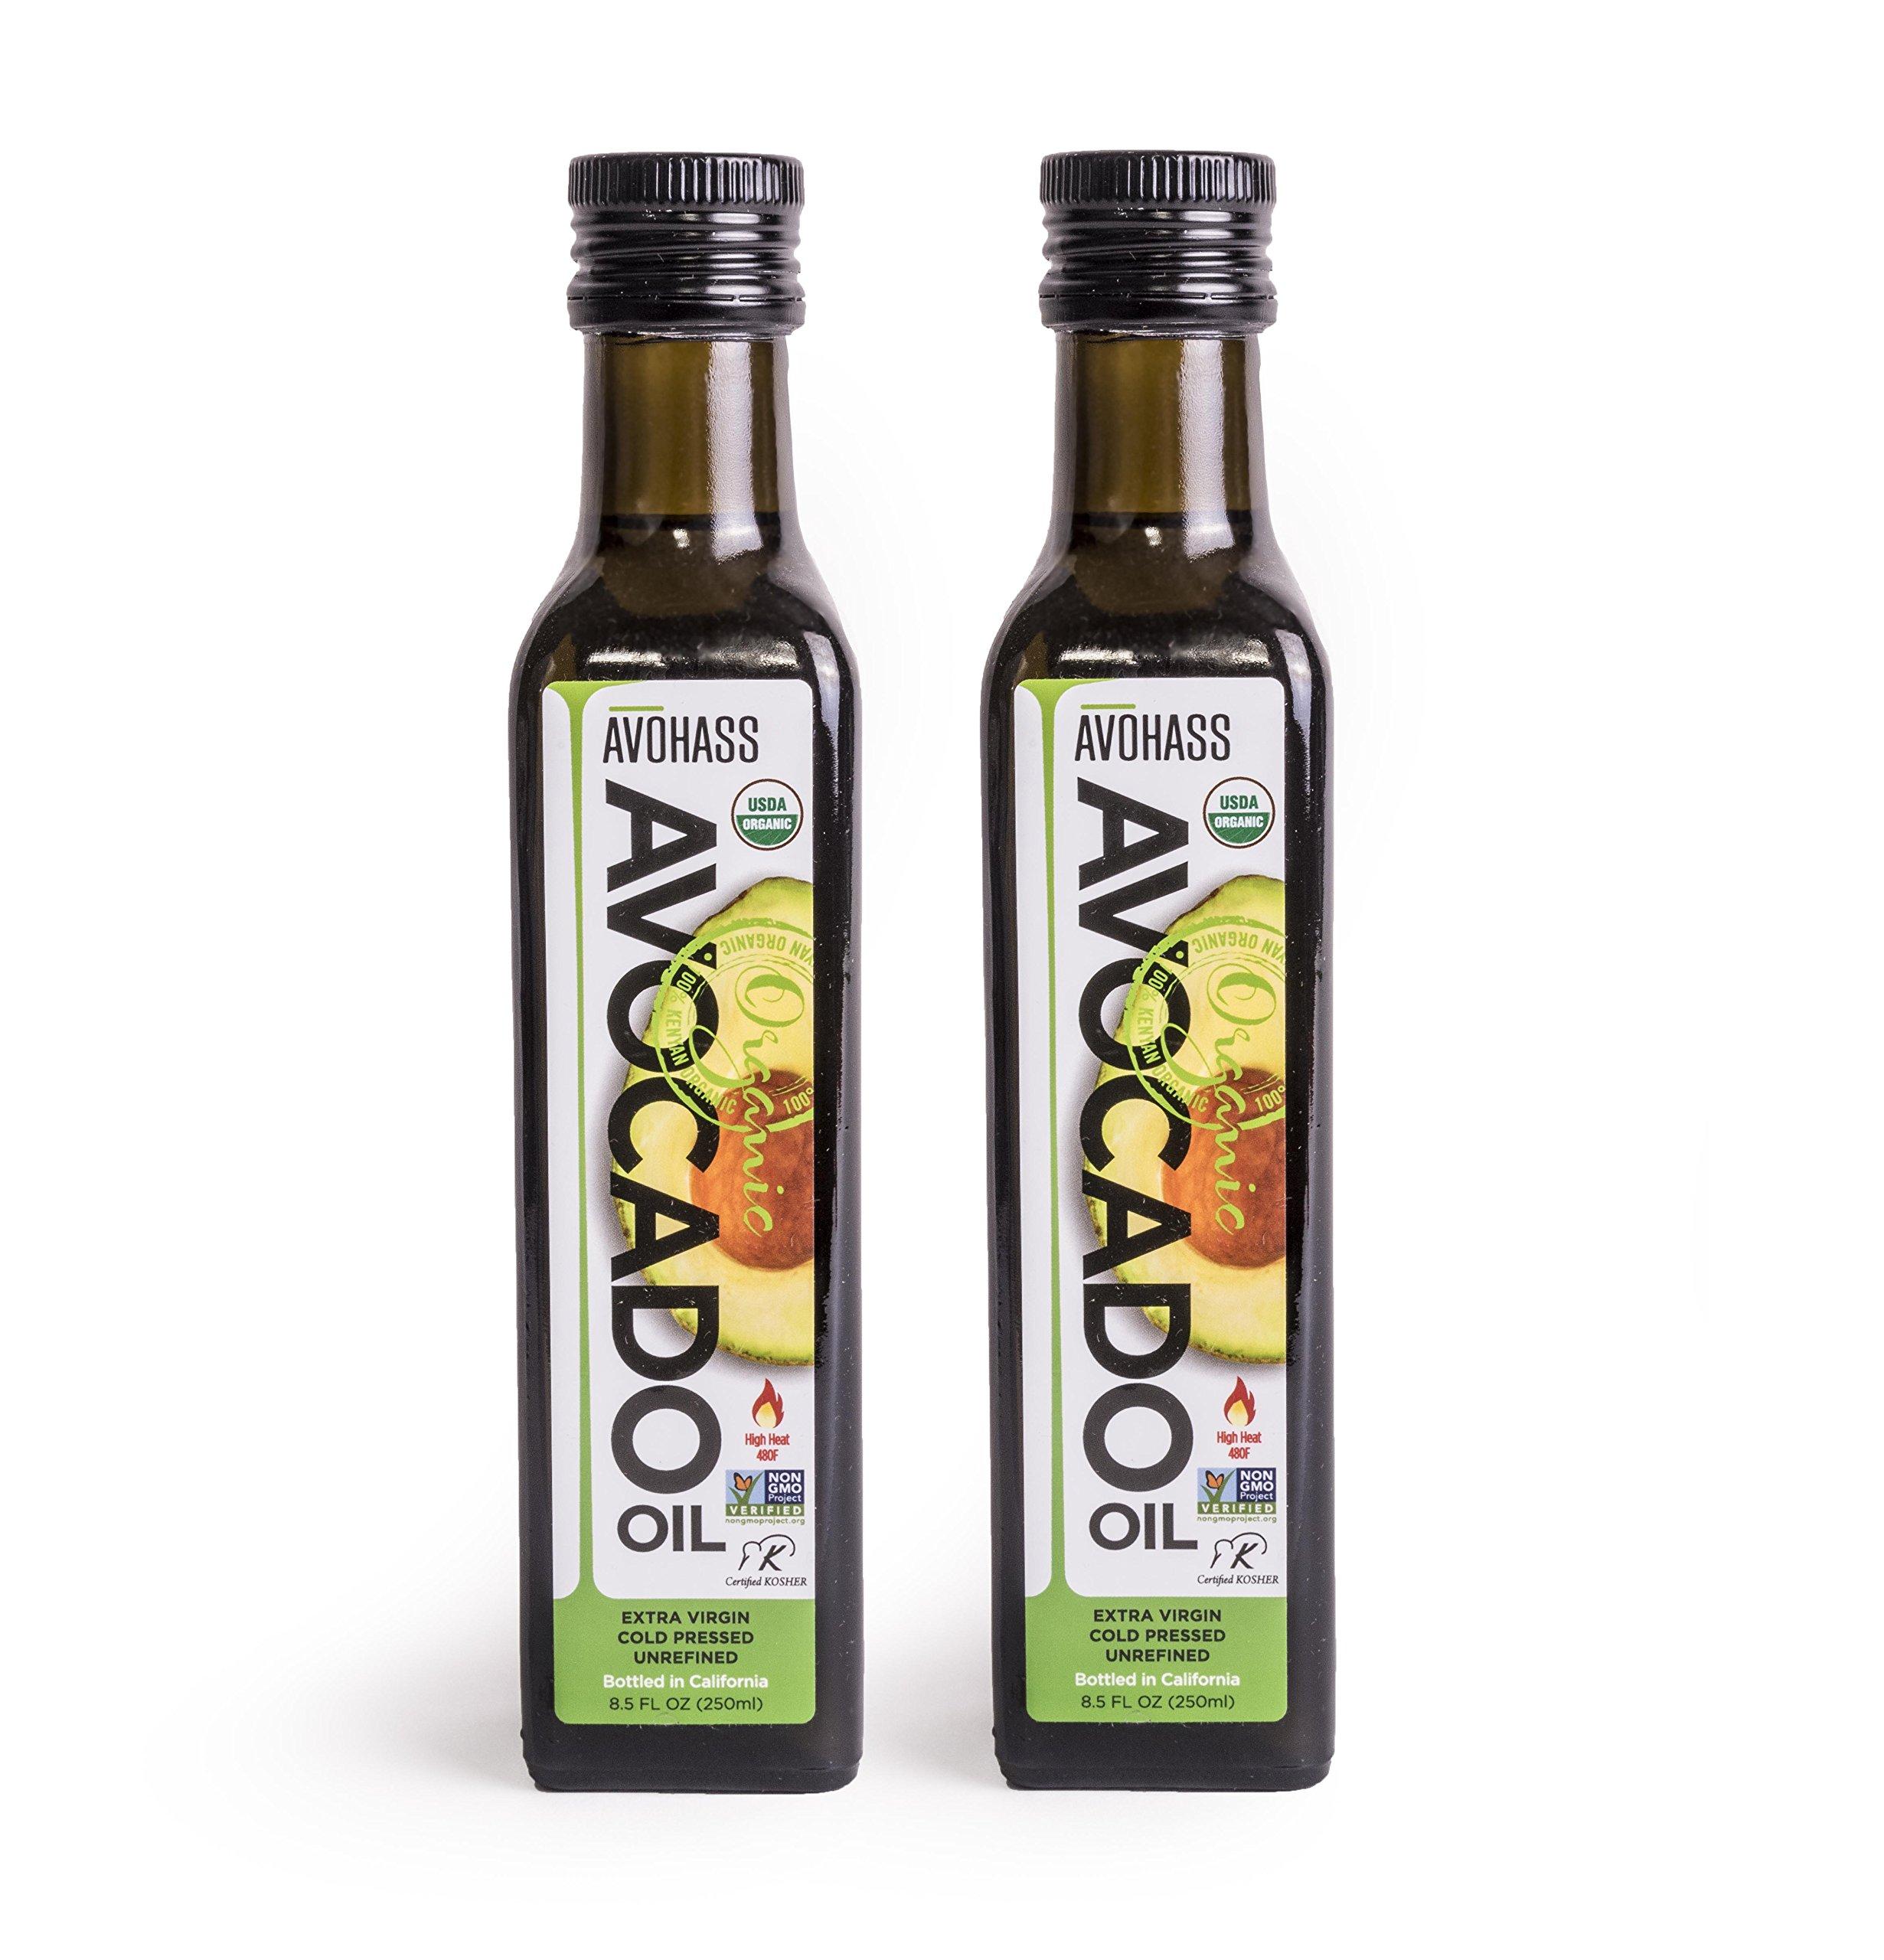 Avohass California Organic Extra Virgin Avocado Oil 2 Bottle Case by AVOHASS (Image #1)